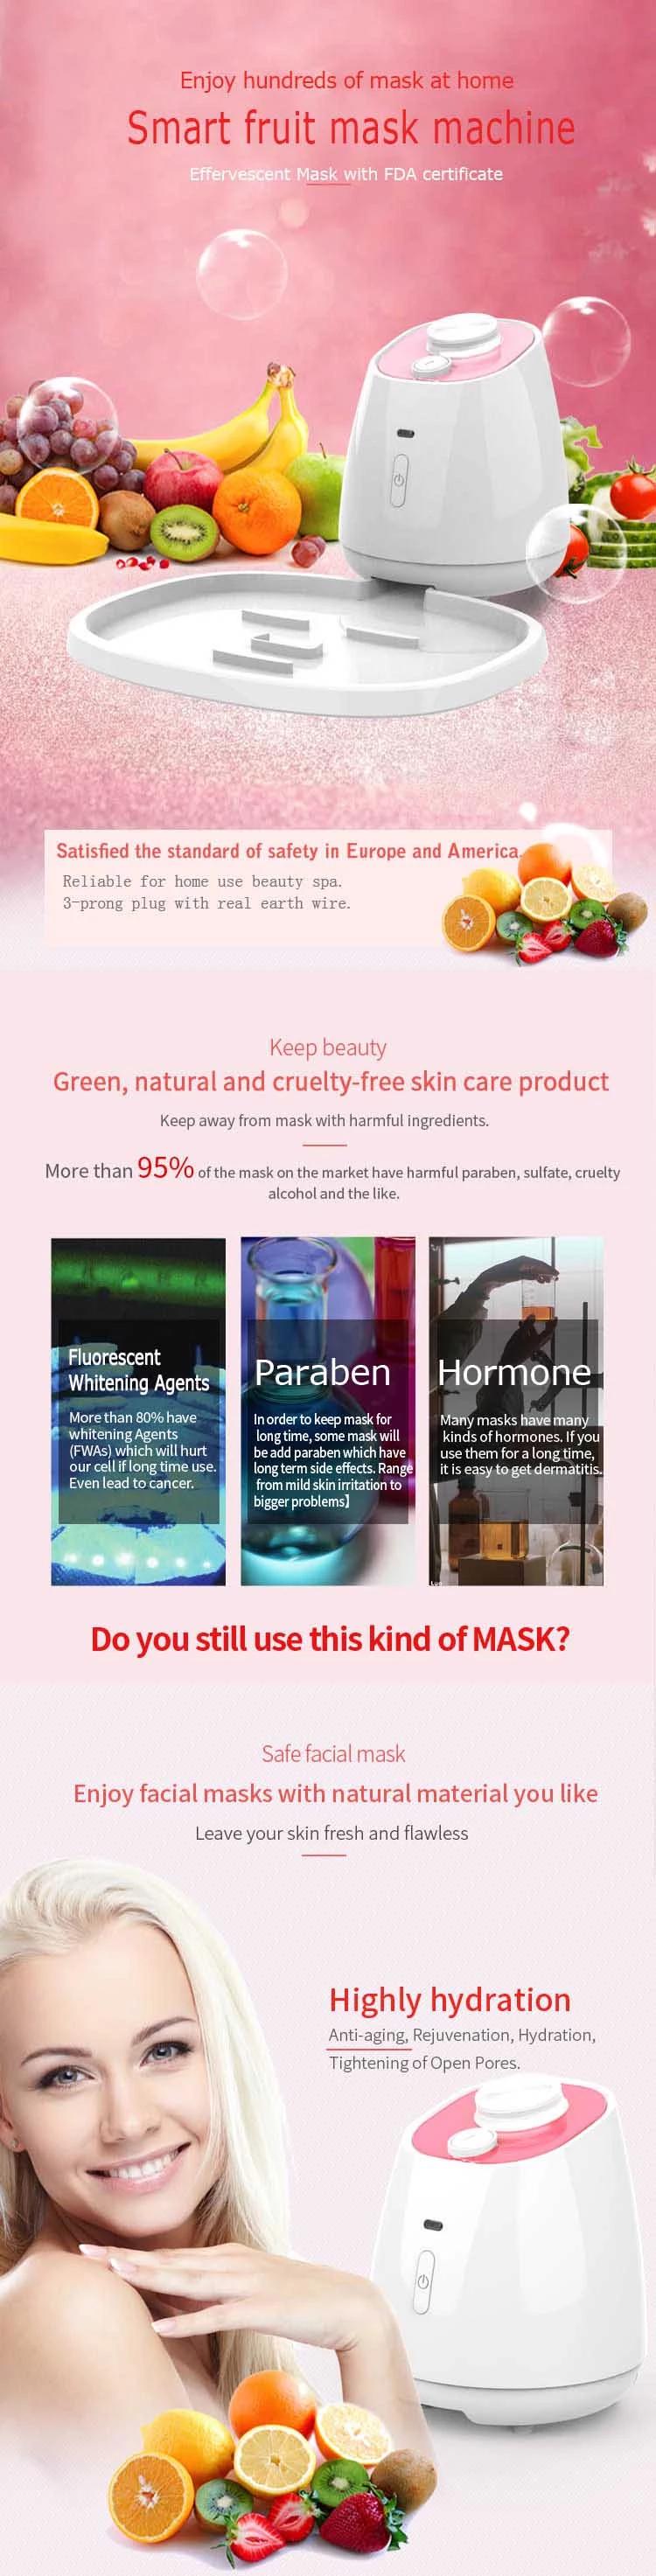 CVB-850 Smart Home use Automatic diy face beauty skin care Collagen fruit vegetable natural facial mask maker machine